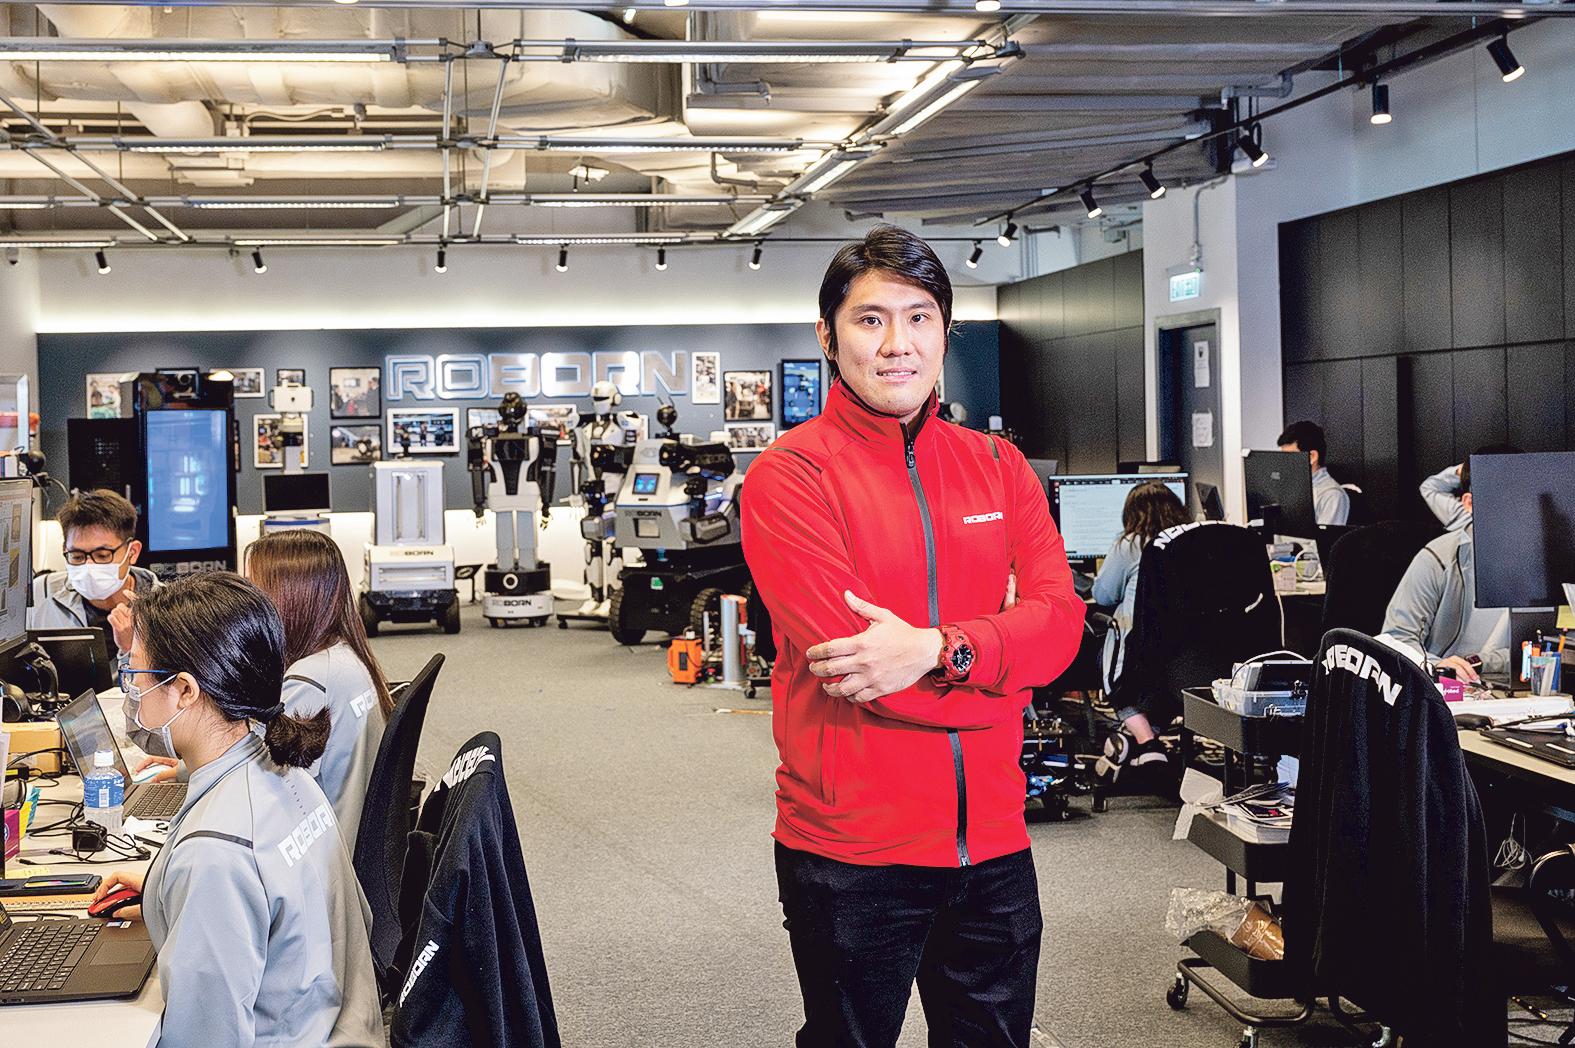 5G機械人產業發展潛力大,麥騫譽( M a r k ) 憑着不放棄、求突破的精神,帶領團隊研發出多款智能機械人,造福人類。